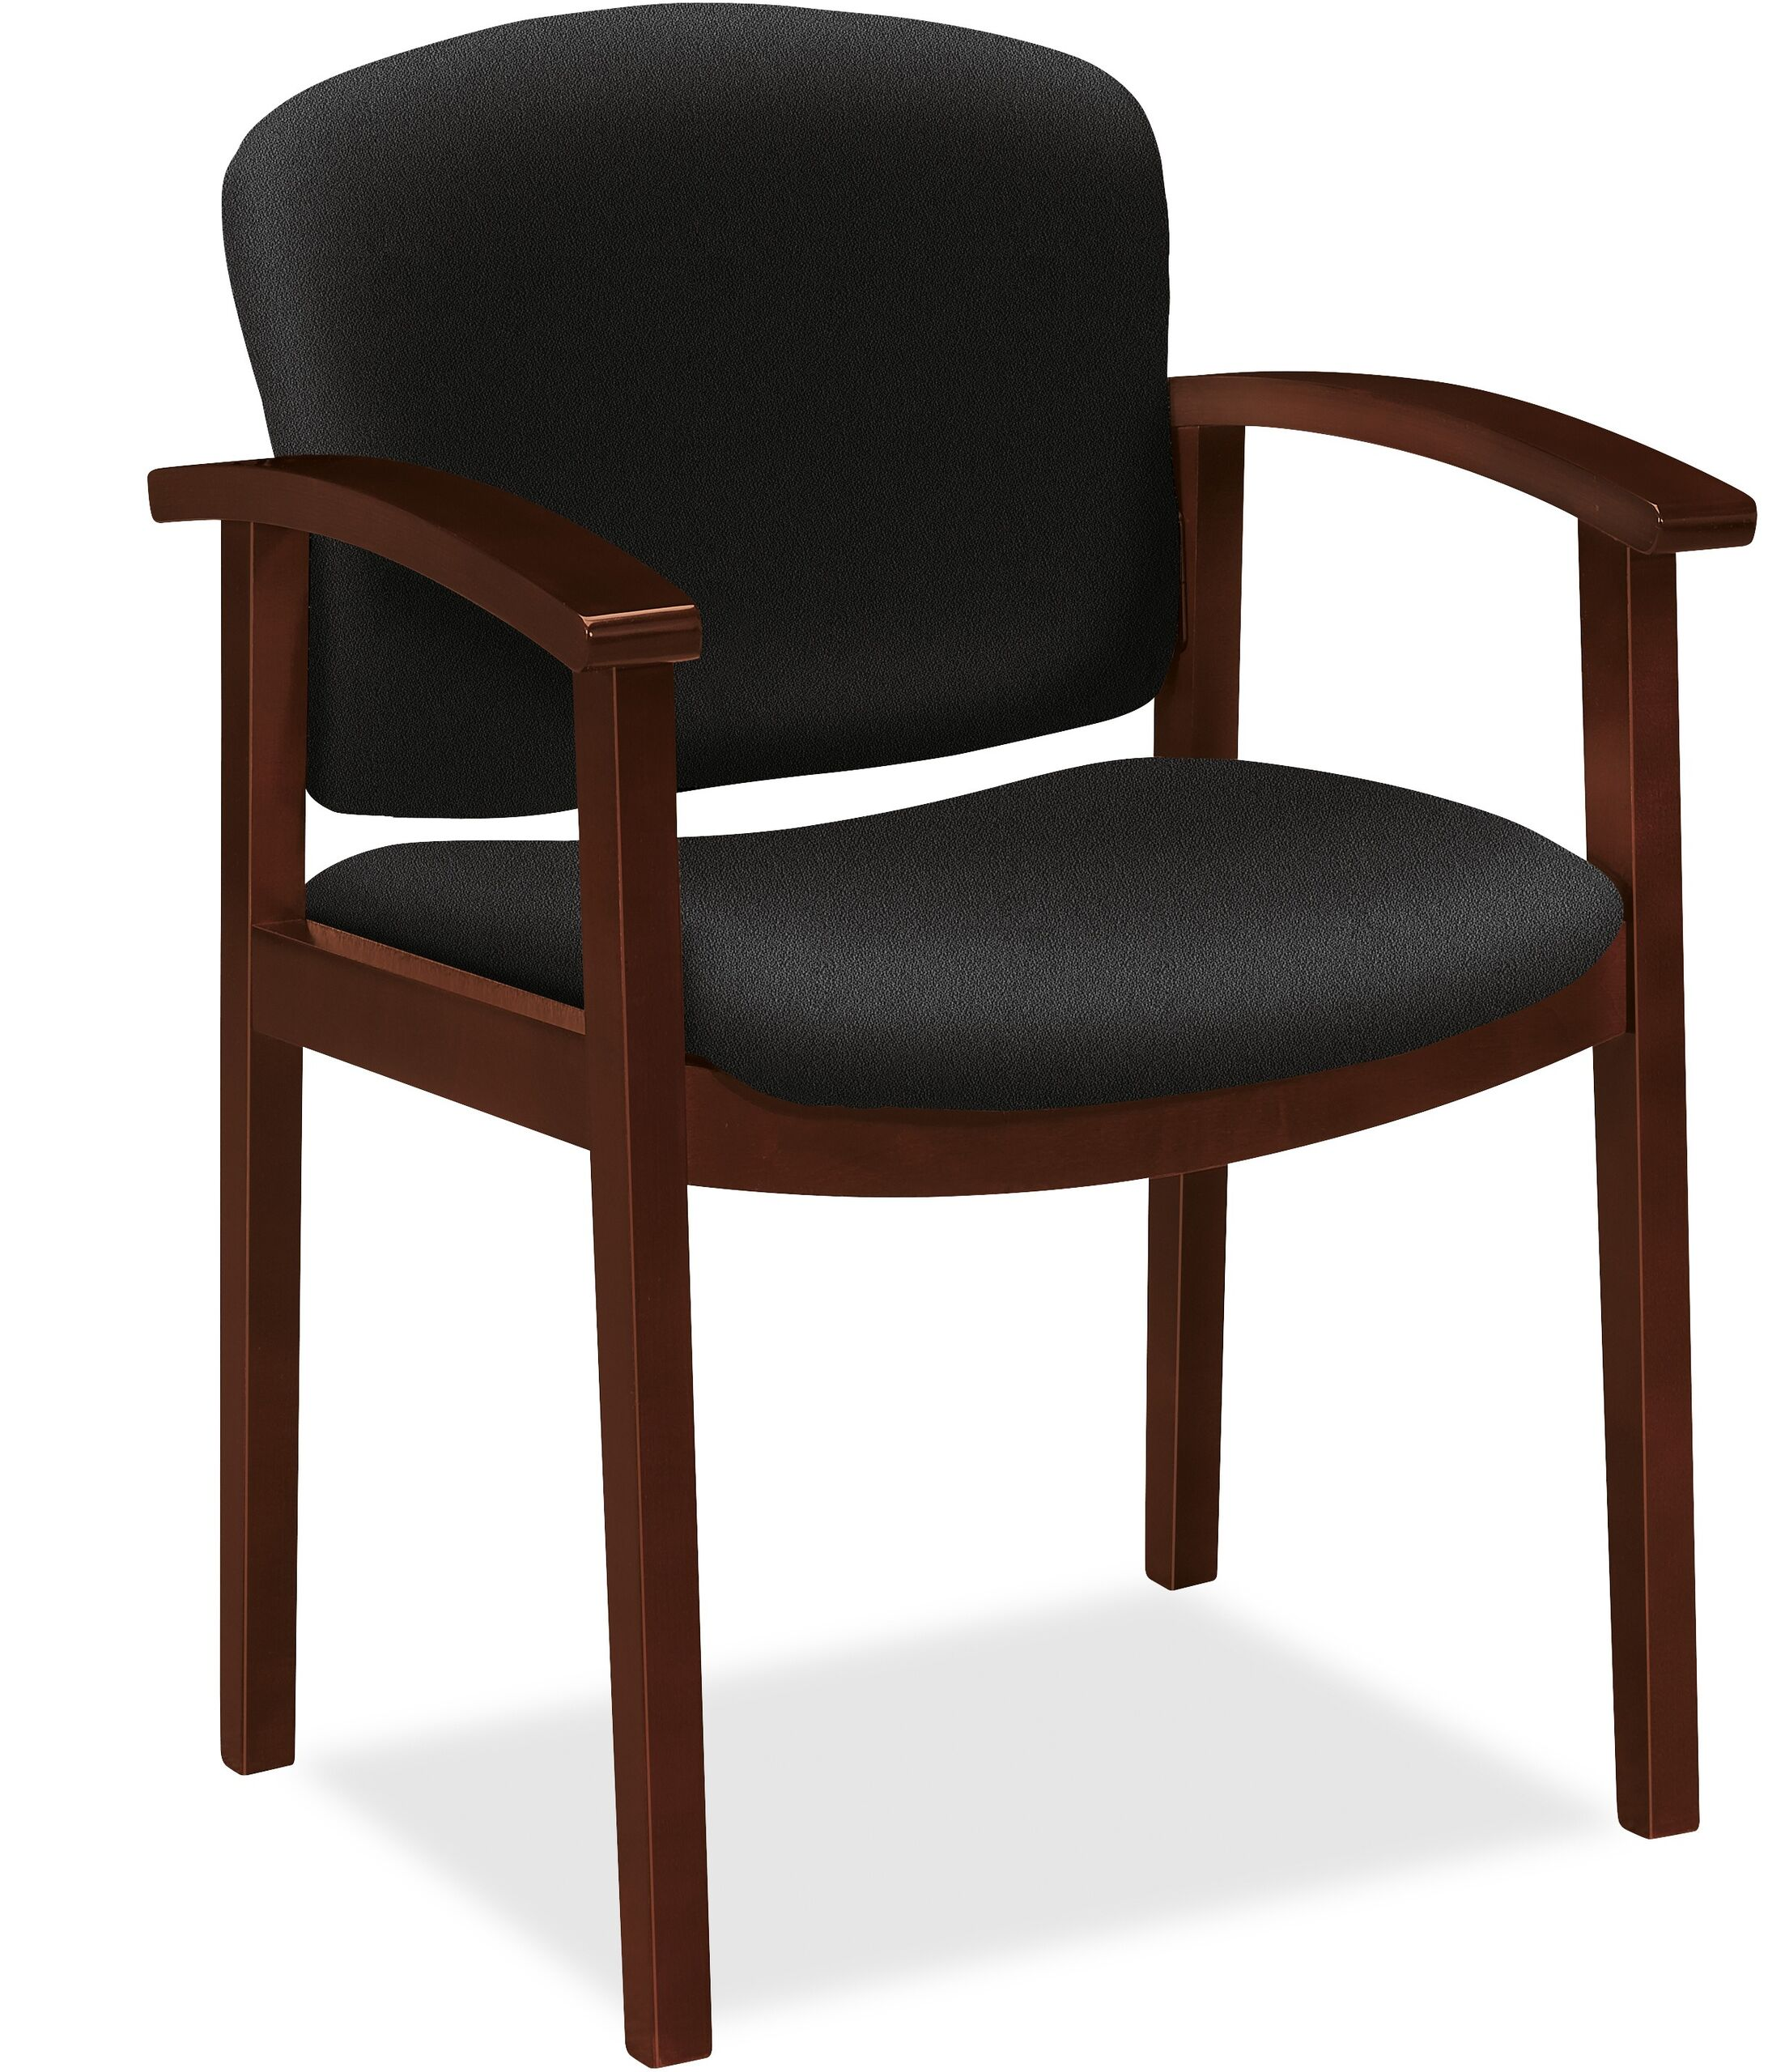 Guest Chair Seat Color: Black, Finish: Mocha